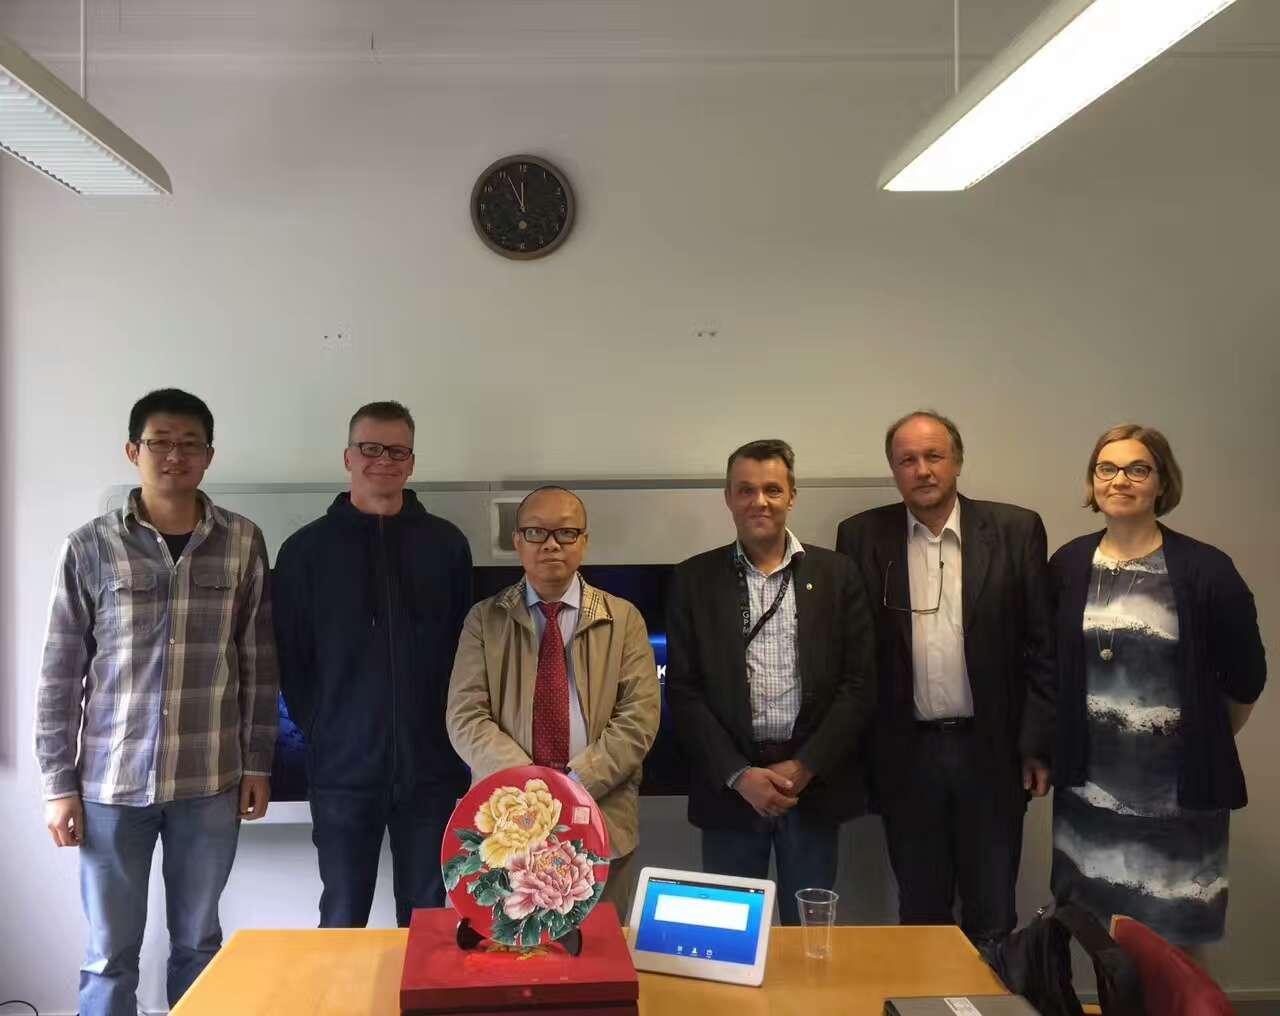 20170607022248006 - A visit to FGI, explore a future cooperation